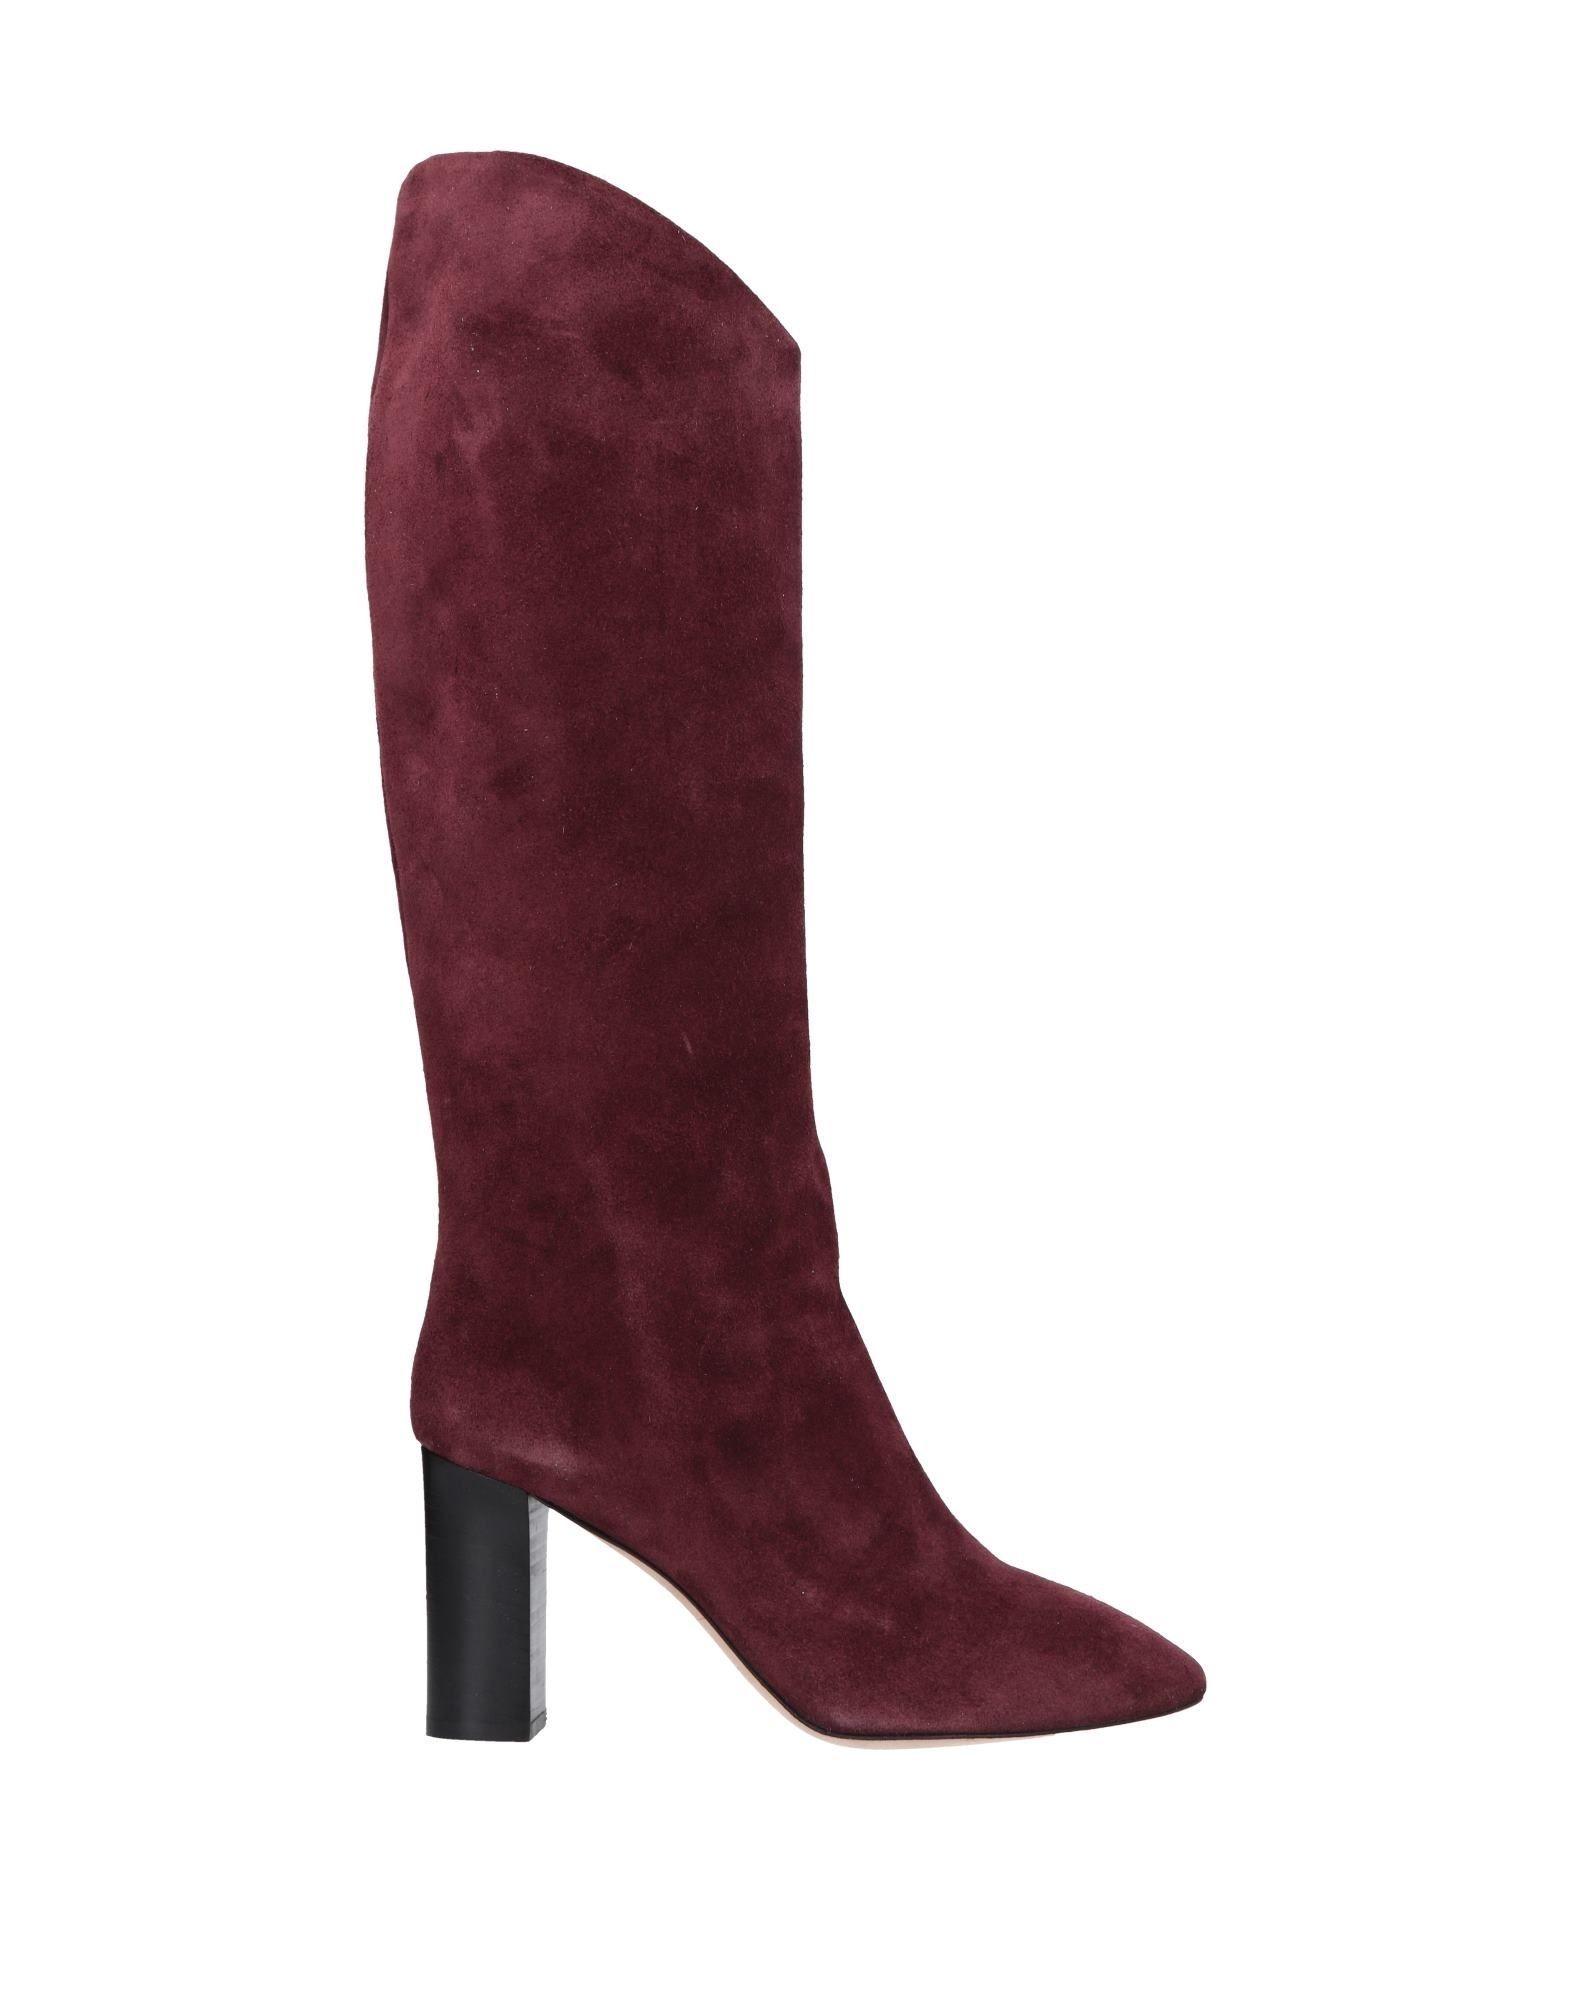 Cavallini Women's Boots Leather